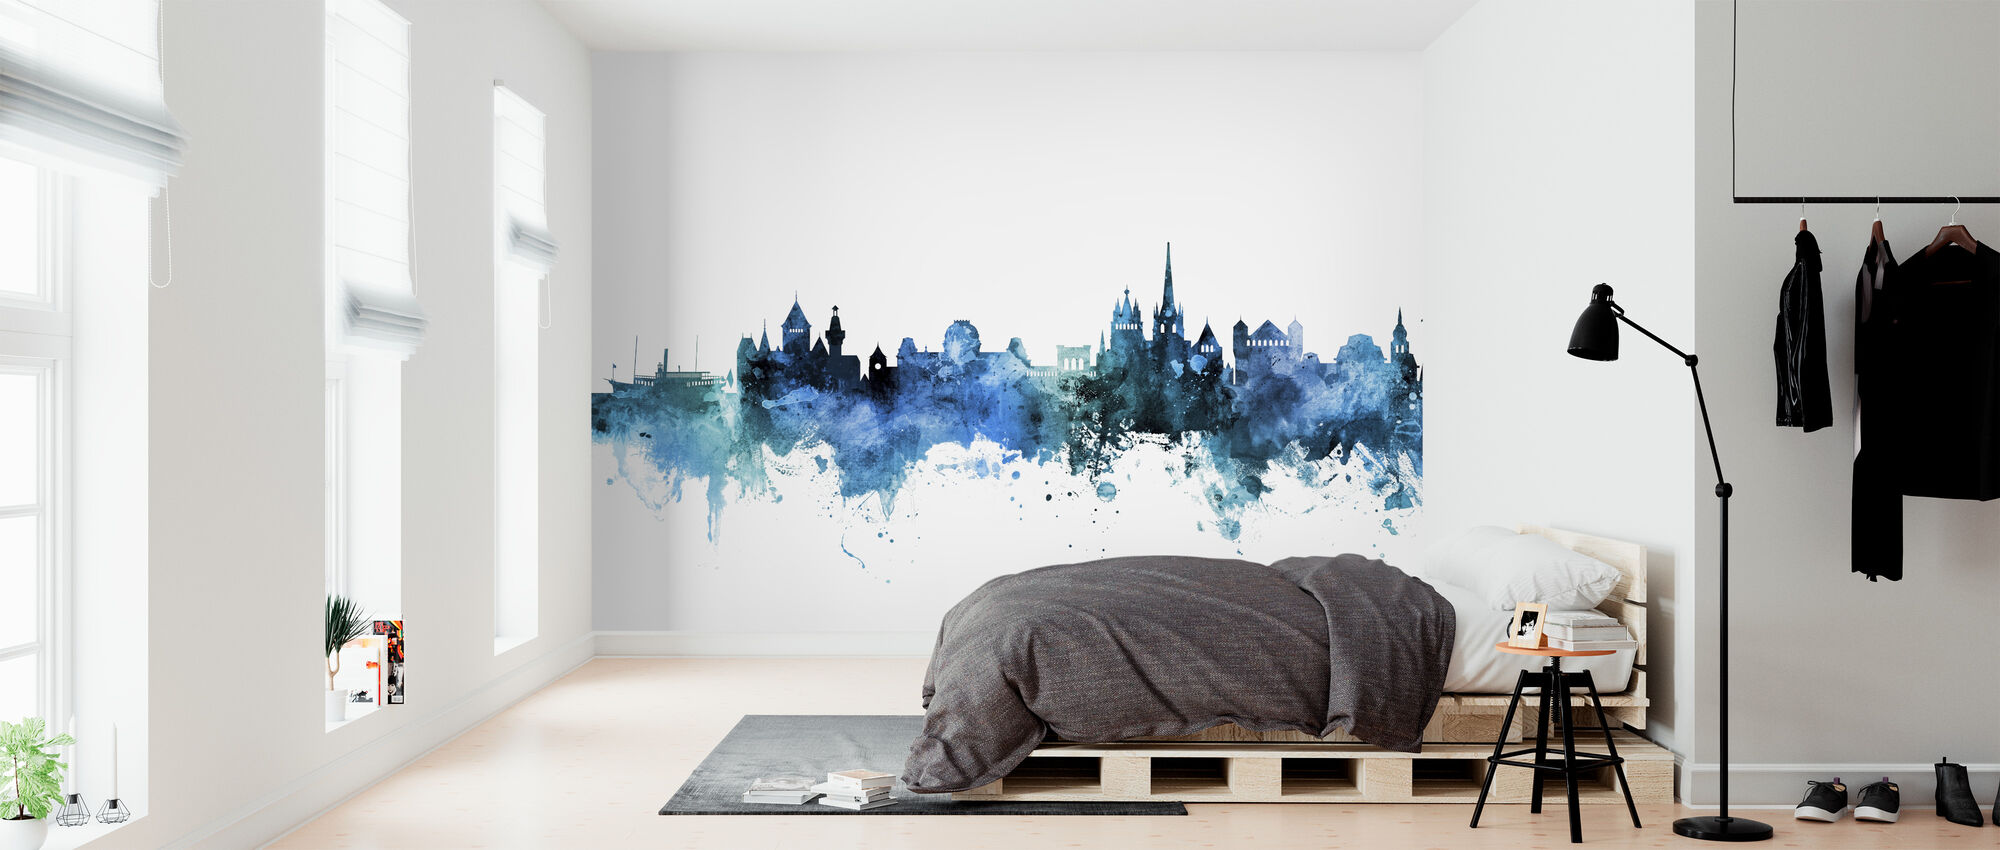 Lausanne Switzerland Skyline - Wallpaper - Bedroom